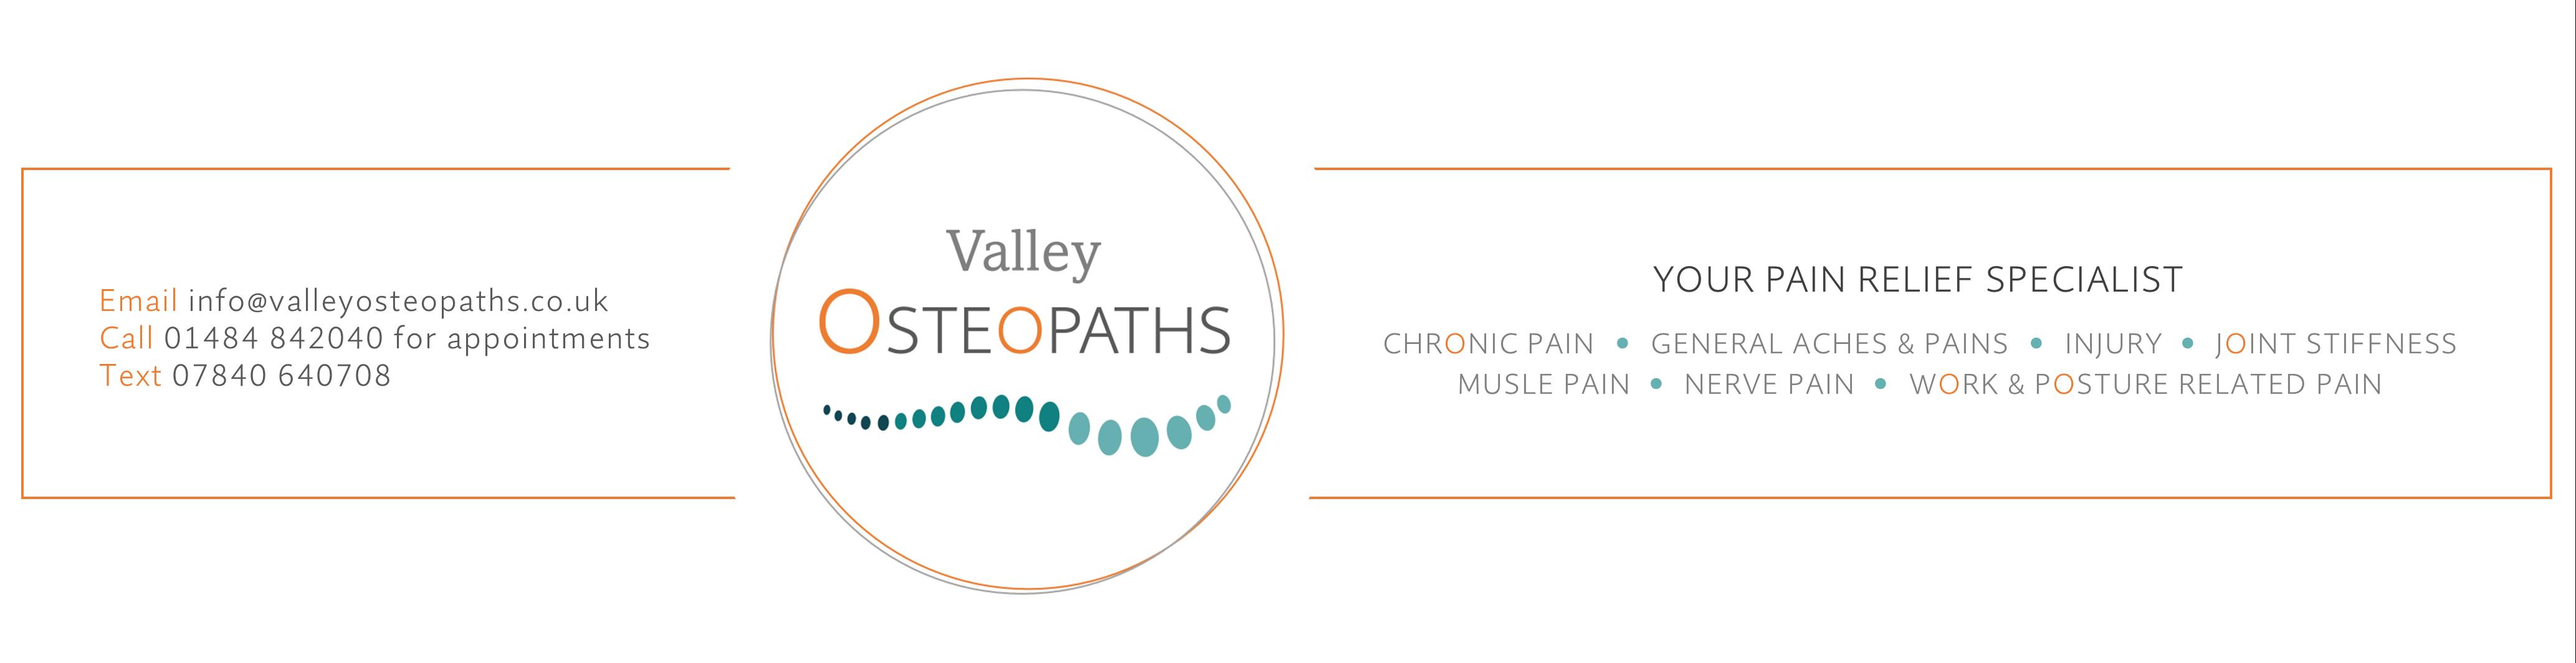 Valley Osteopaths